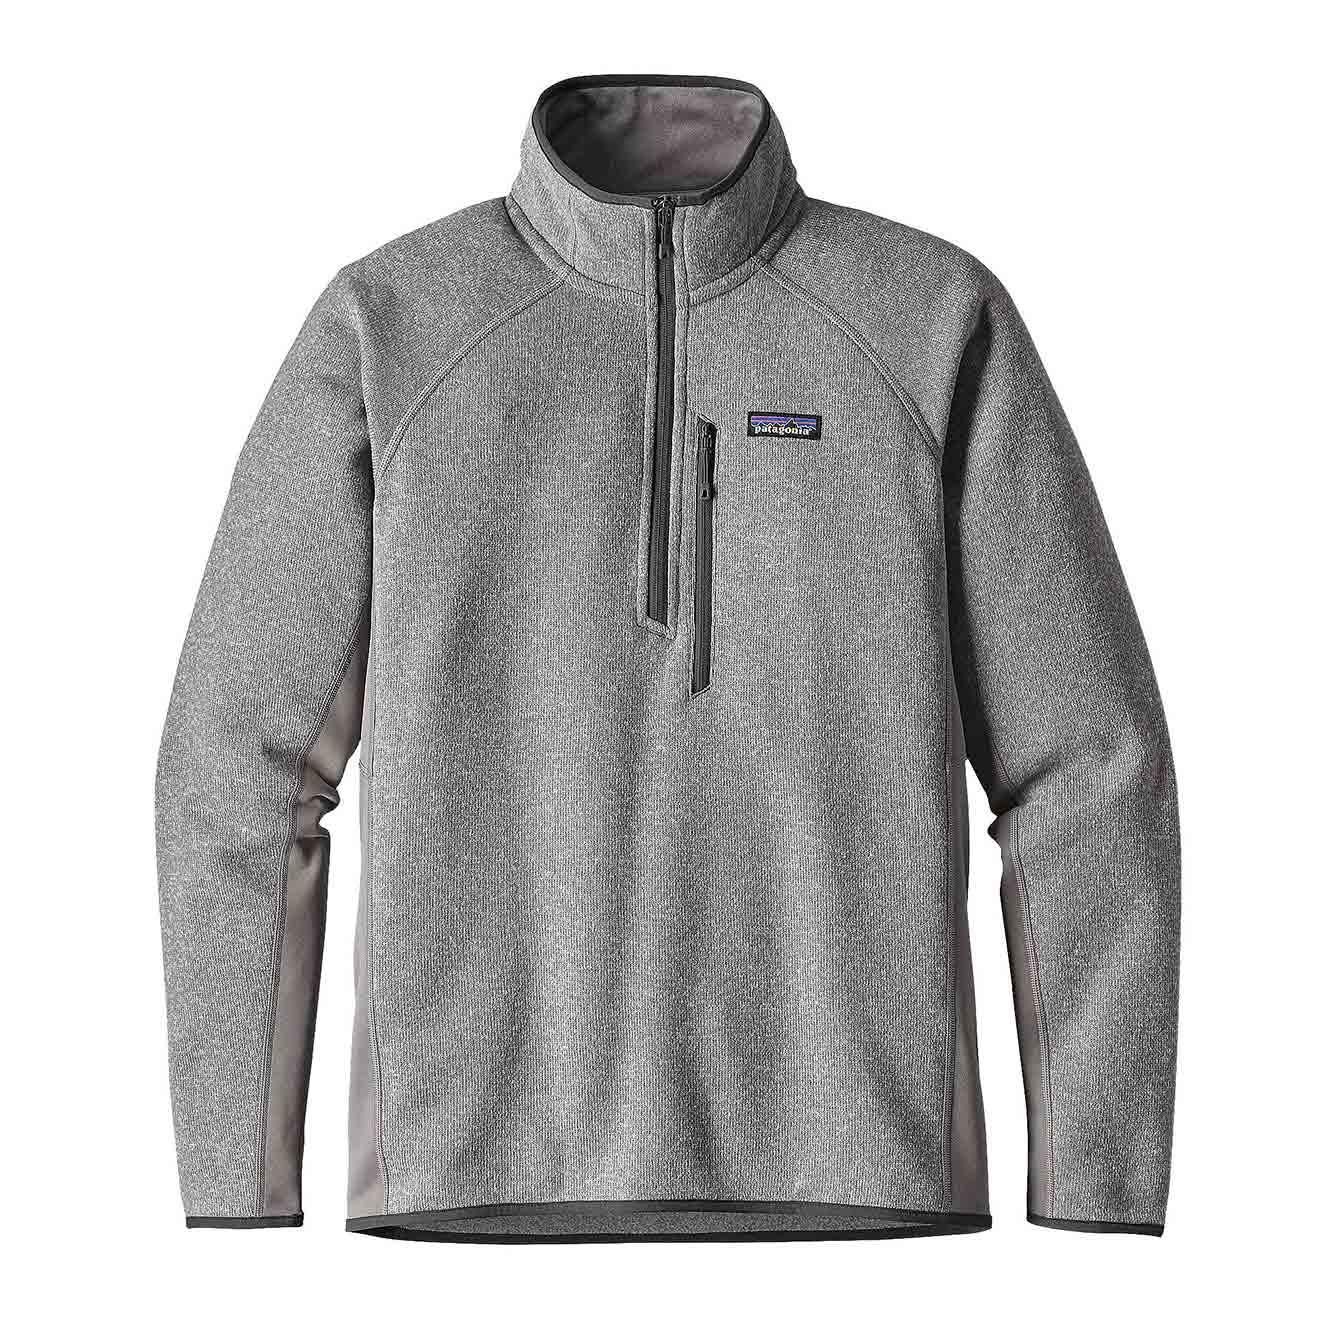 Patagonia Performance Better Sweater 1/4 Zip Fleece Feather Grey